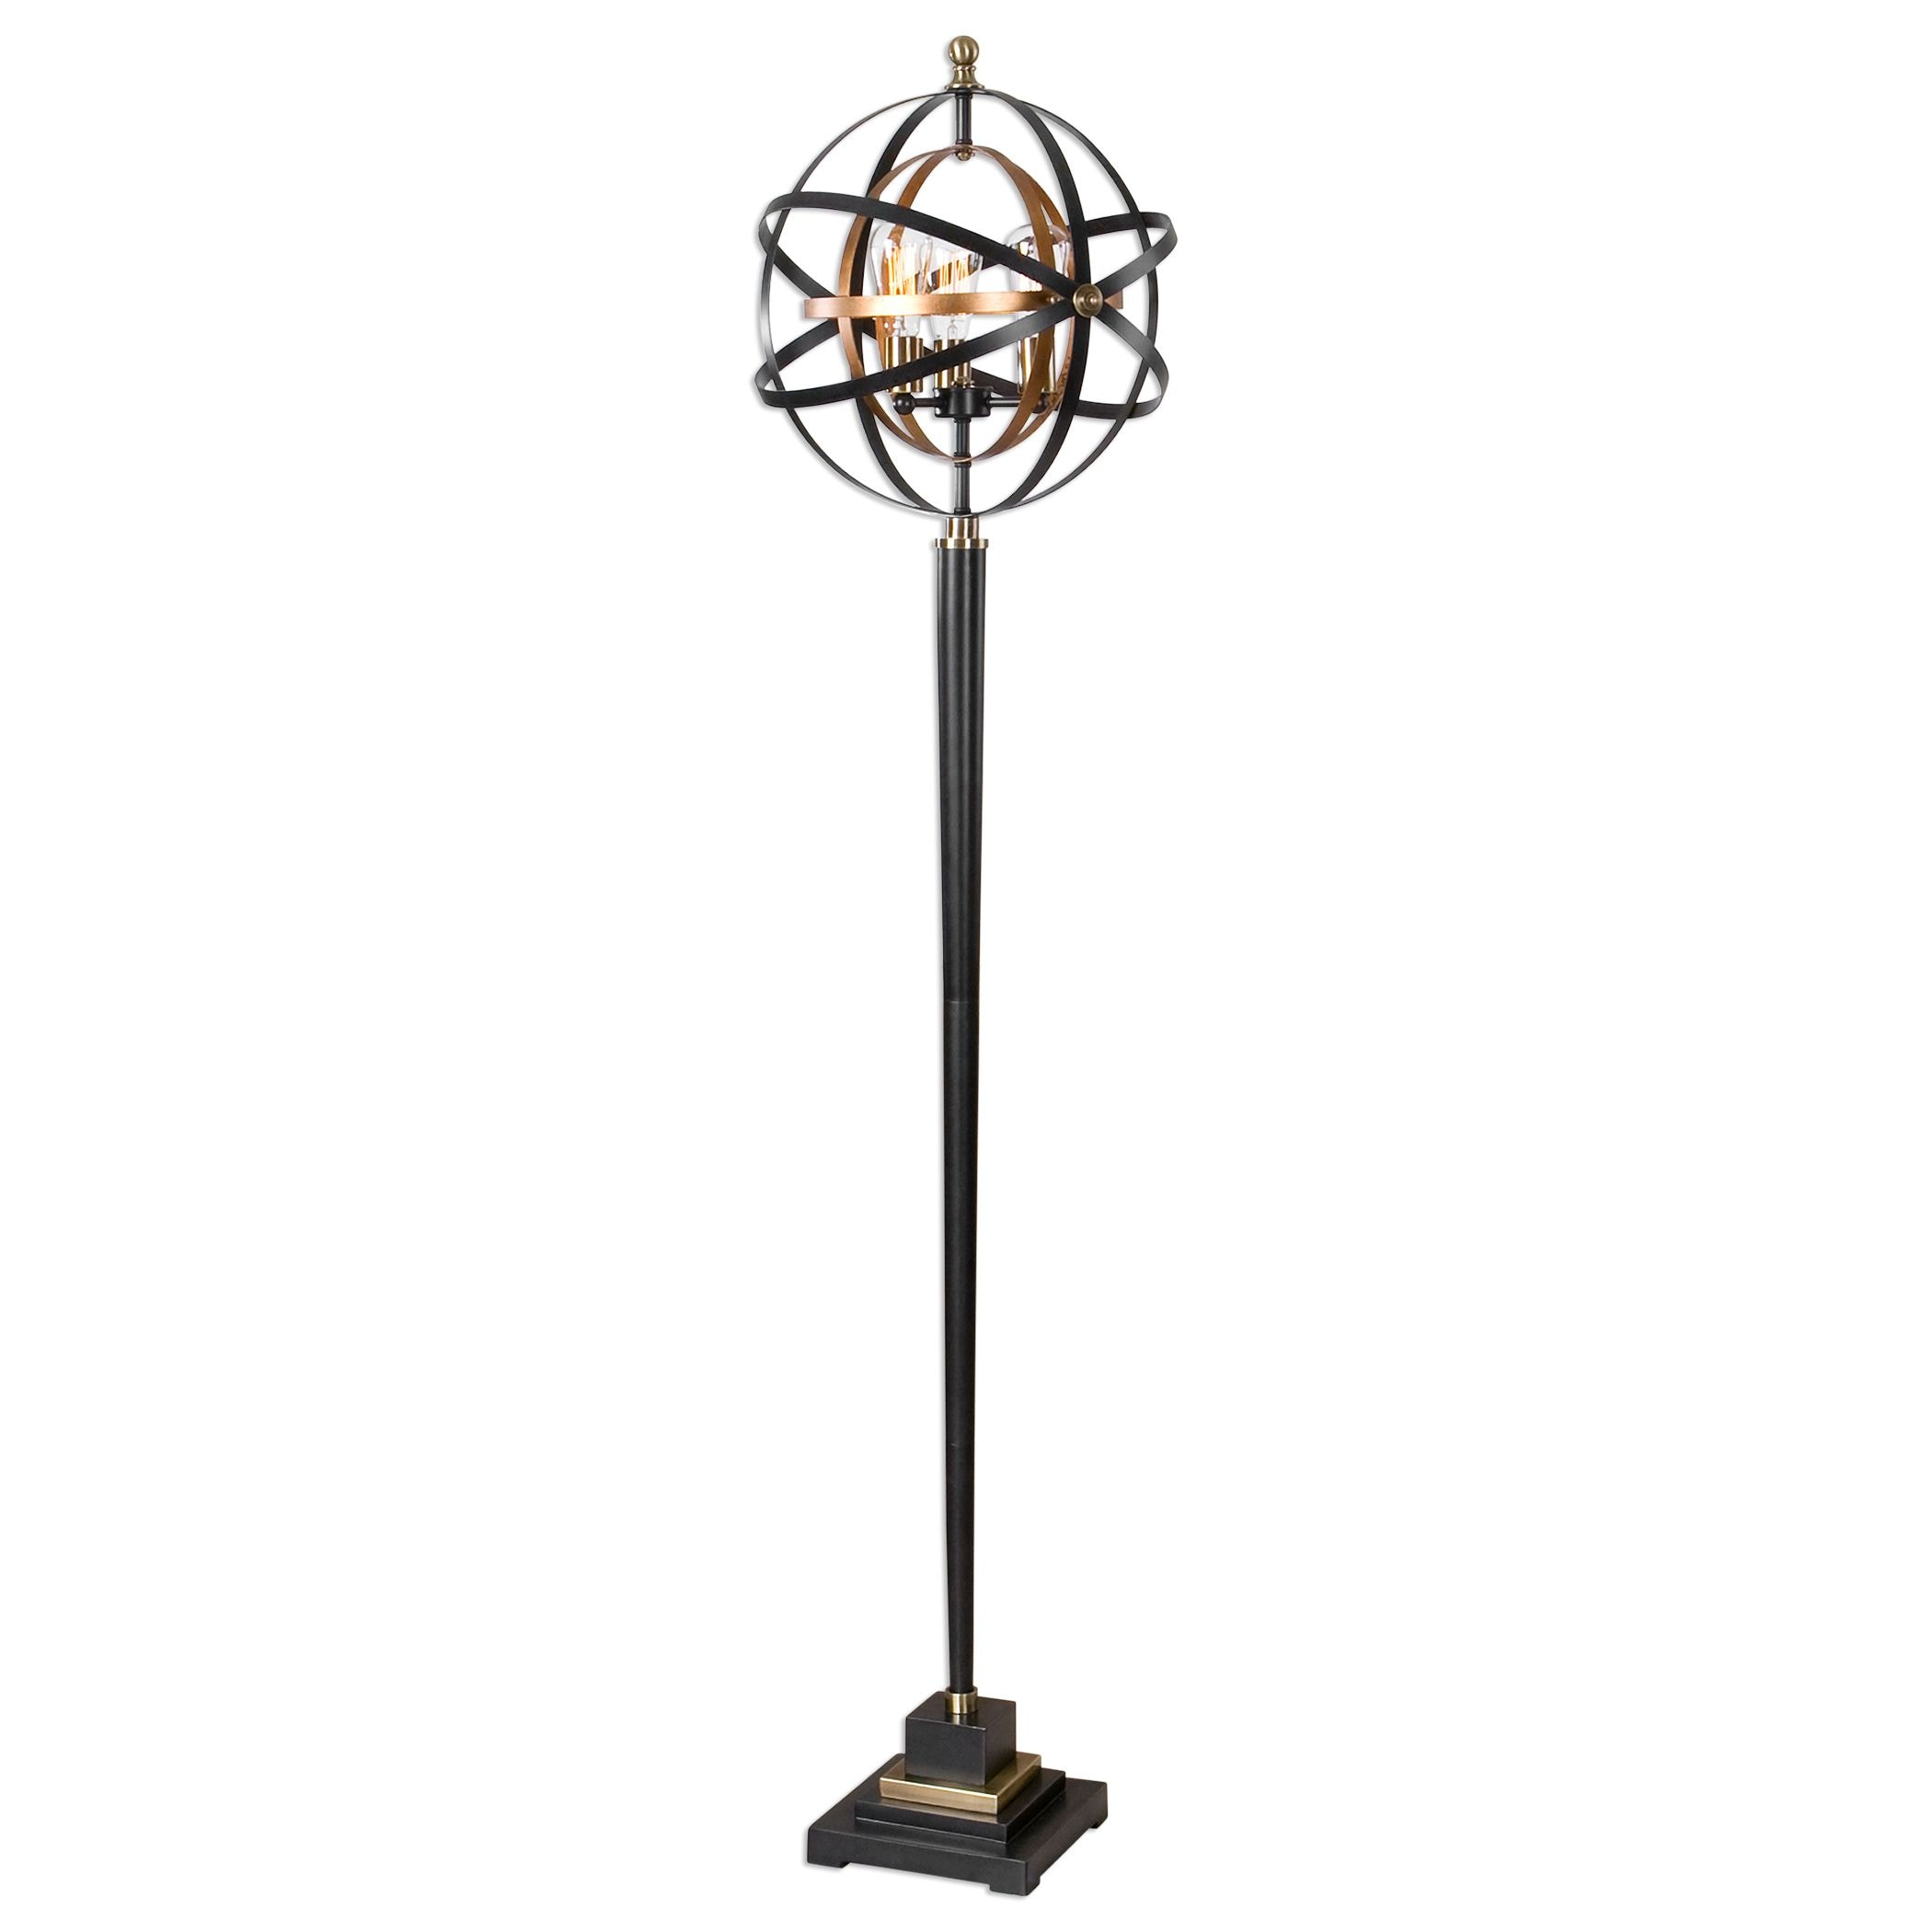 uttermost rondure sphere floor lamp 28087 1 lamps and lighting uttermost rondure sphere floor lamp 28087 1      rh   goodshomefurnishings